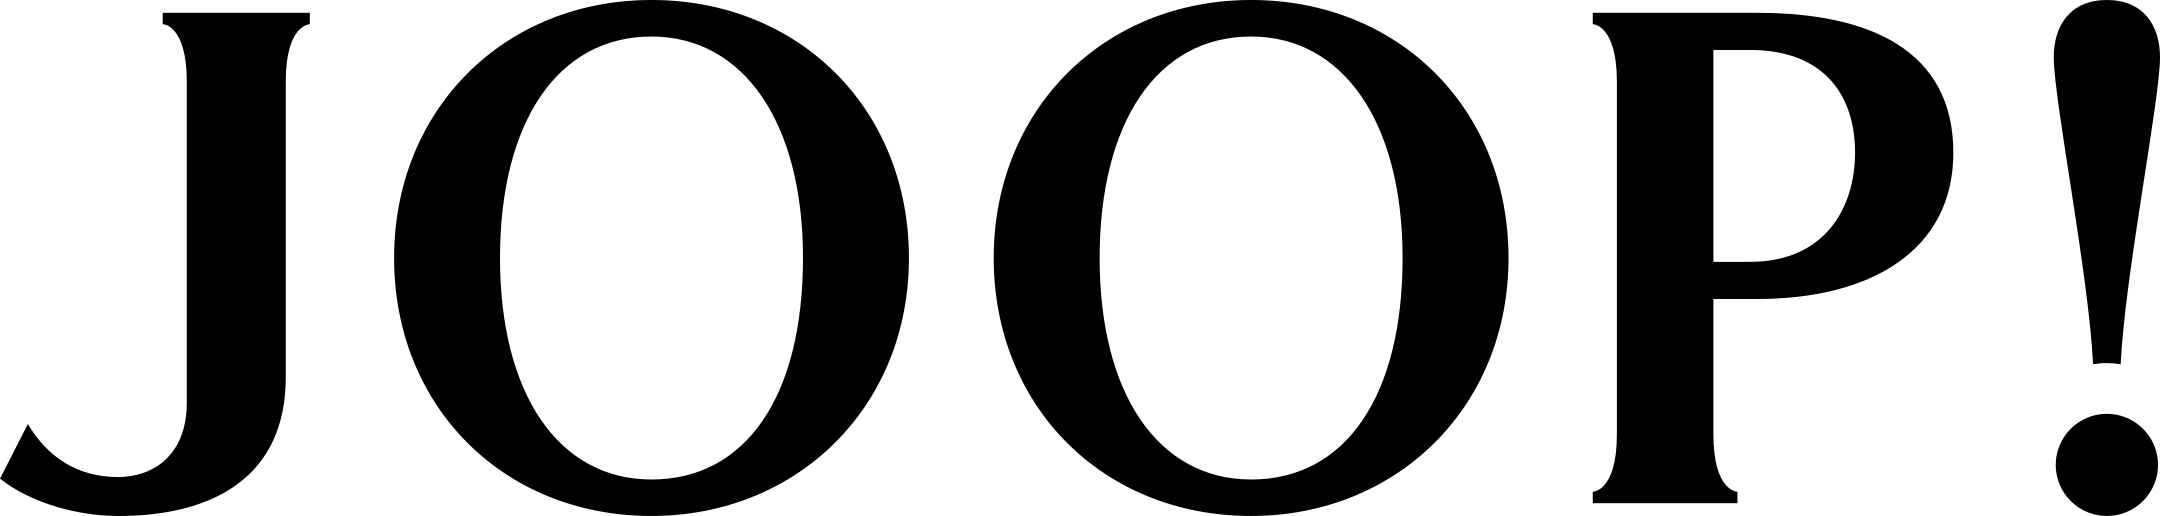 joop logo 1 1 - Joop! Logo